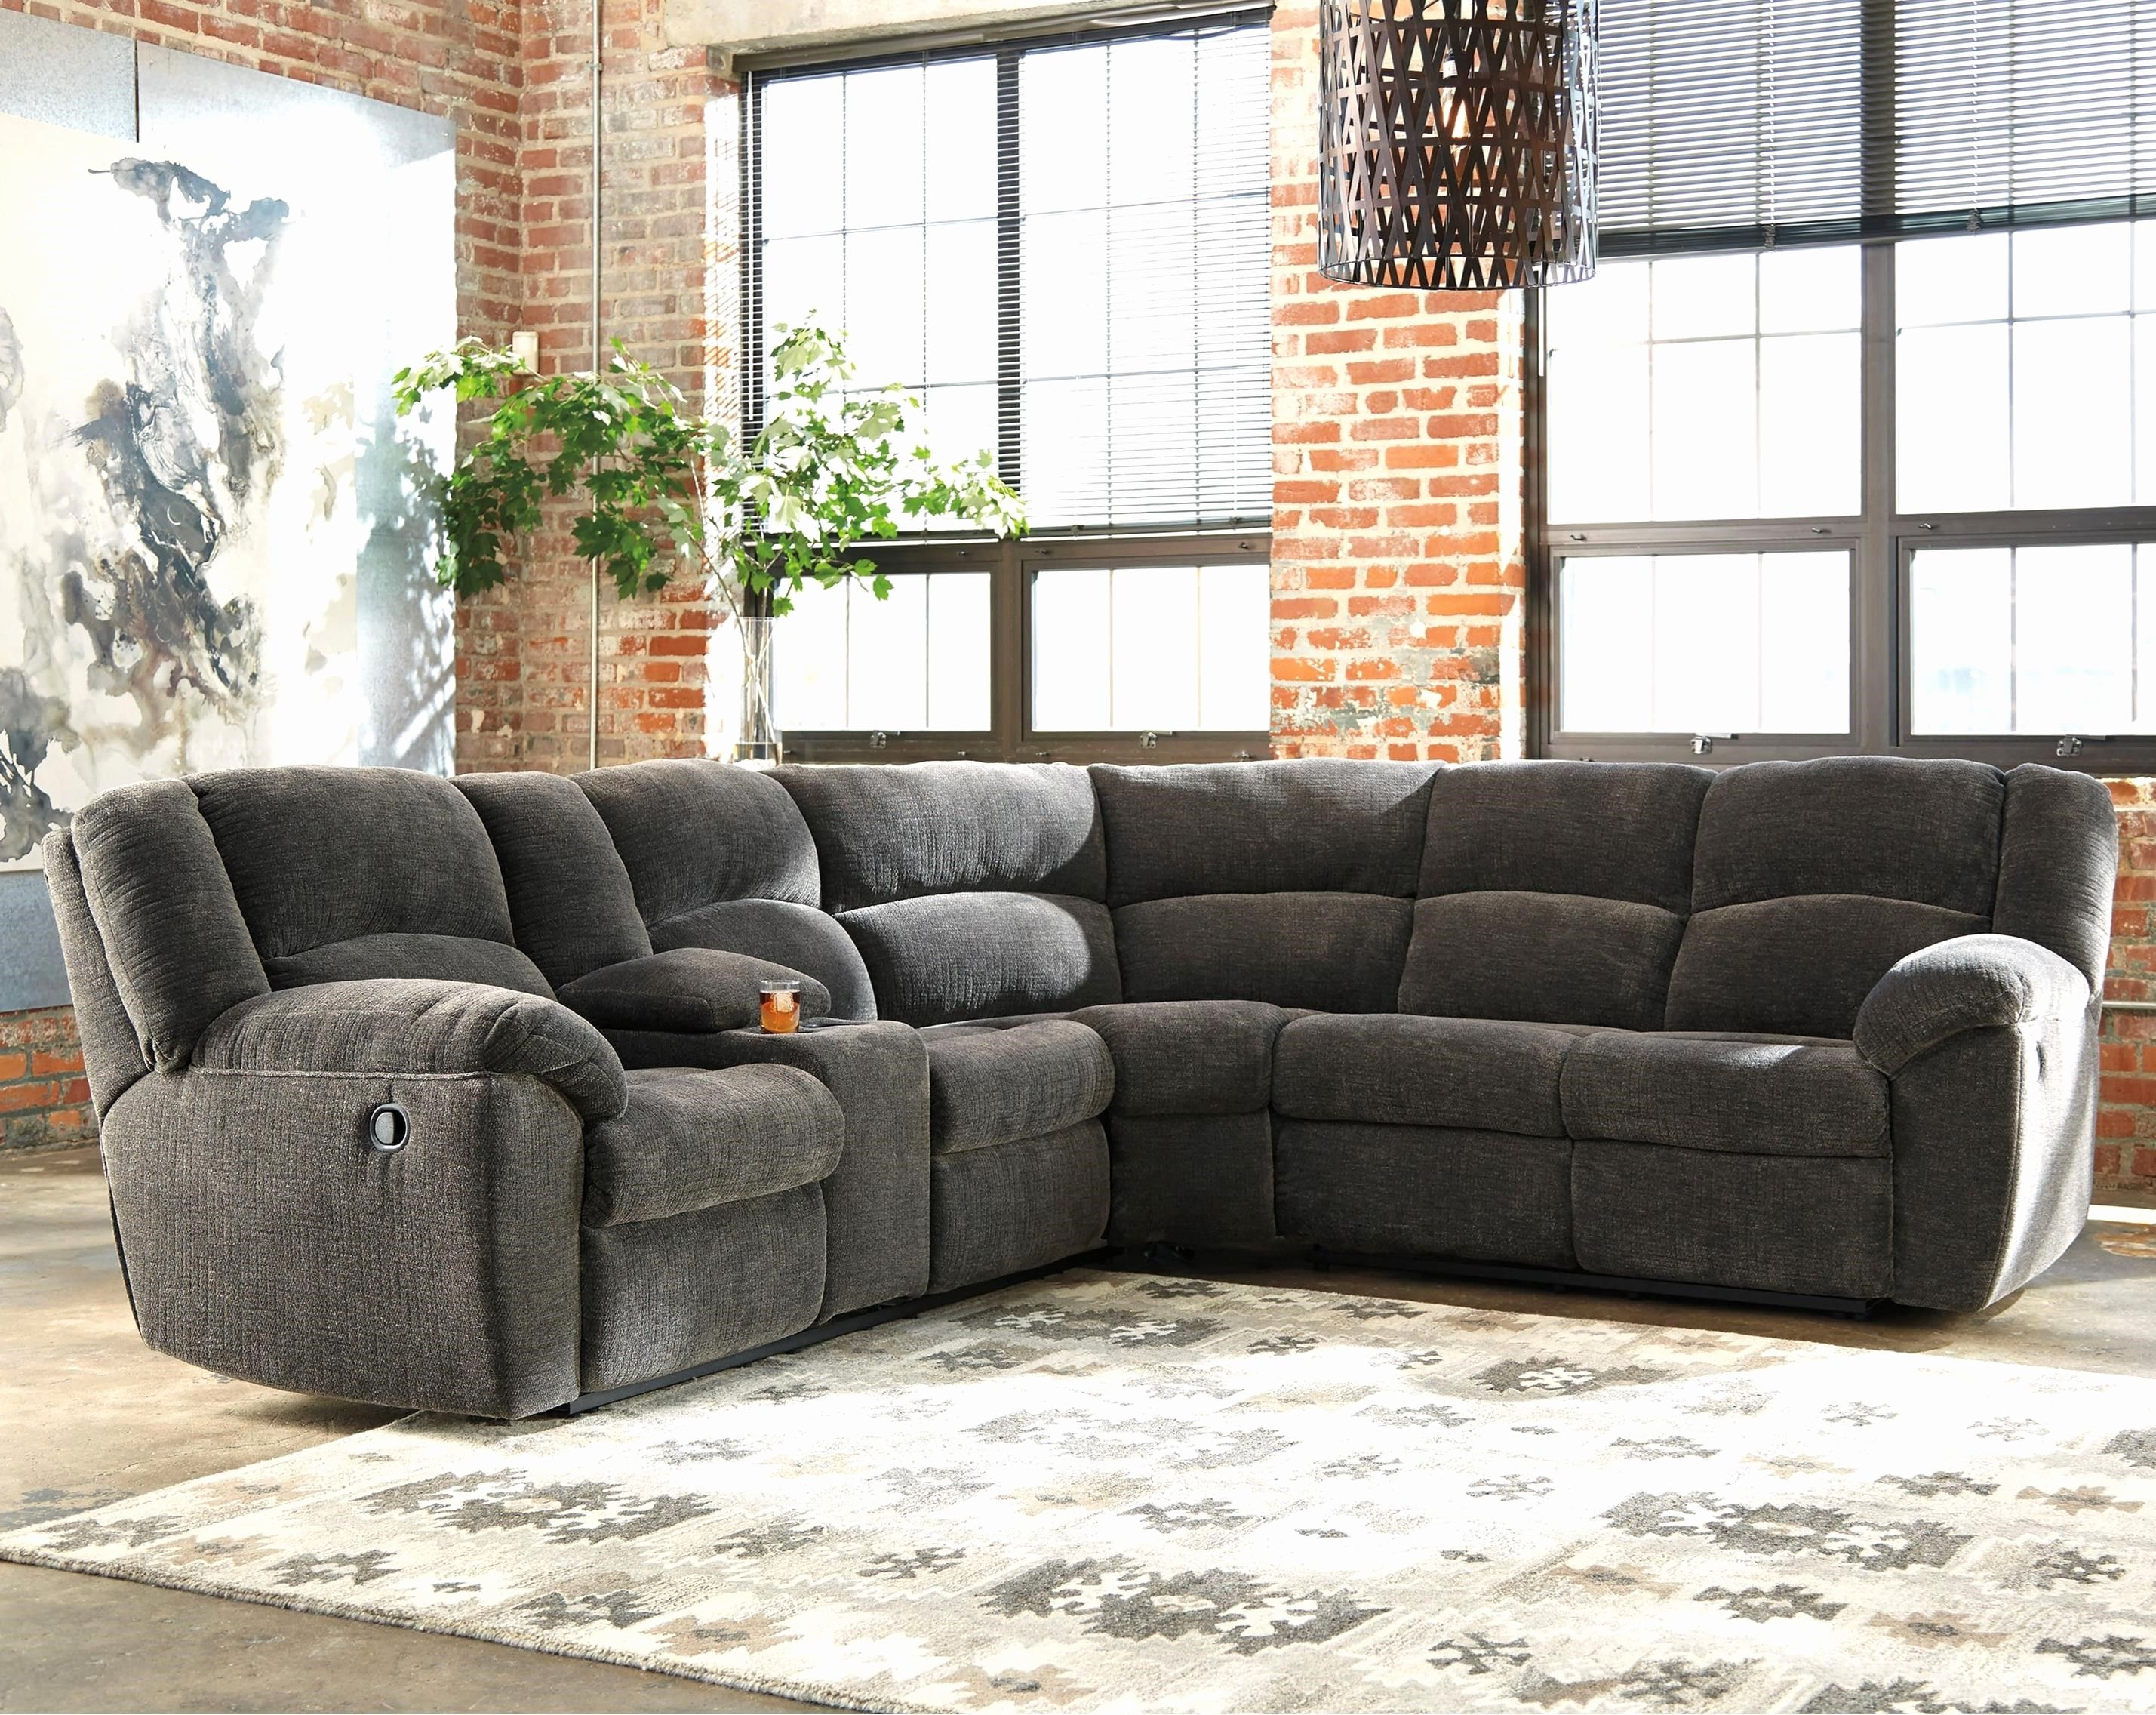 Luxury Microfiber Cleaner for sofa Microfiber Cleaner for ...